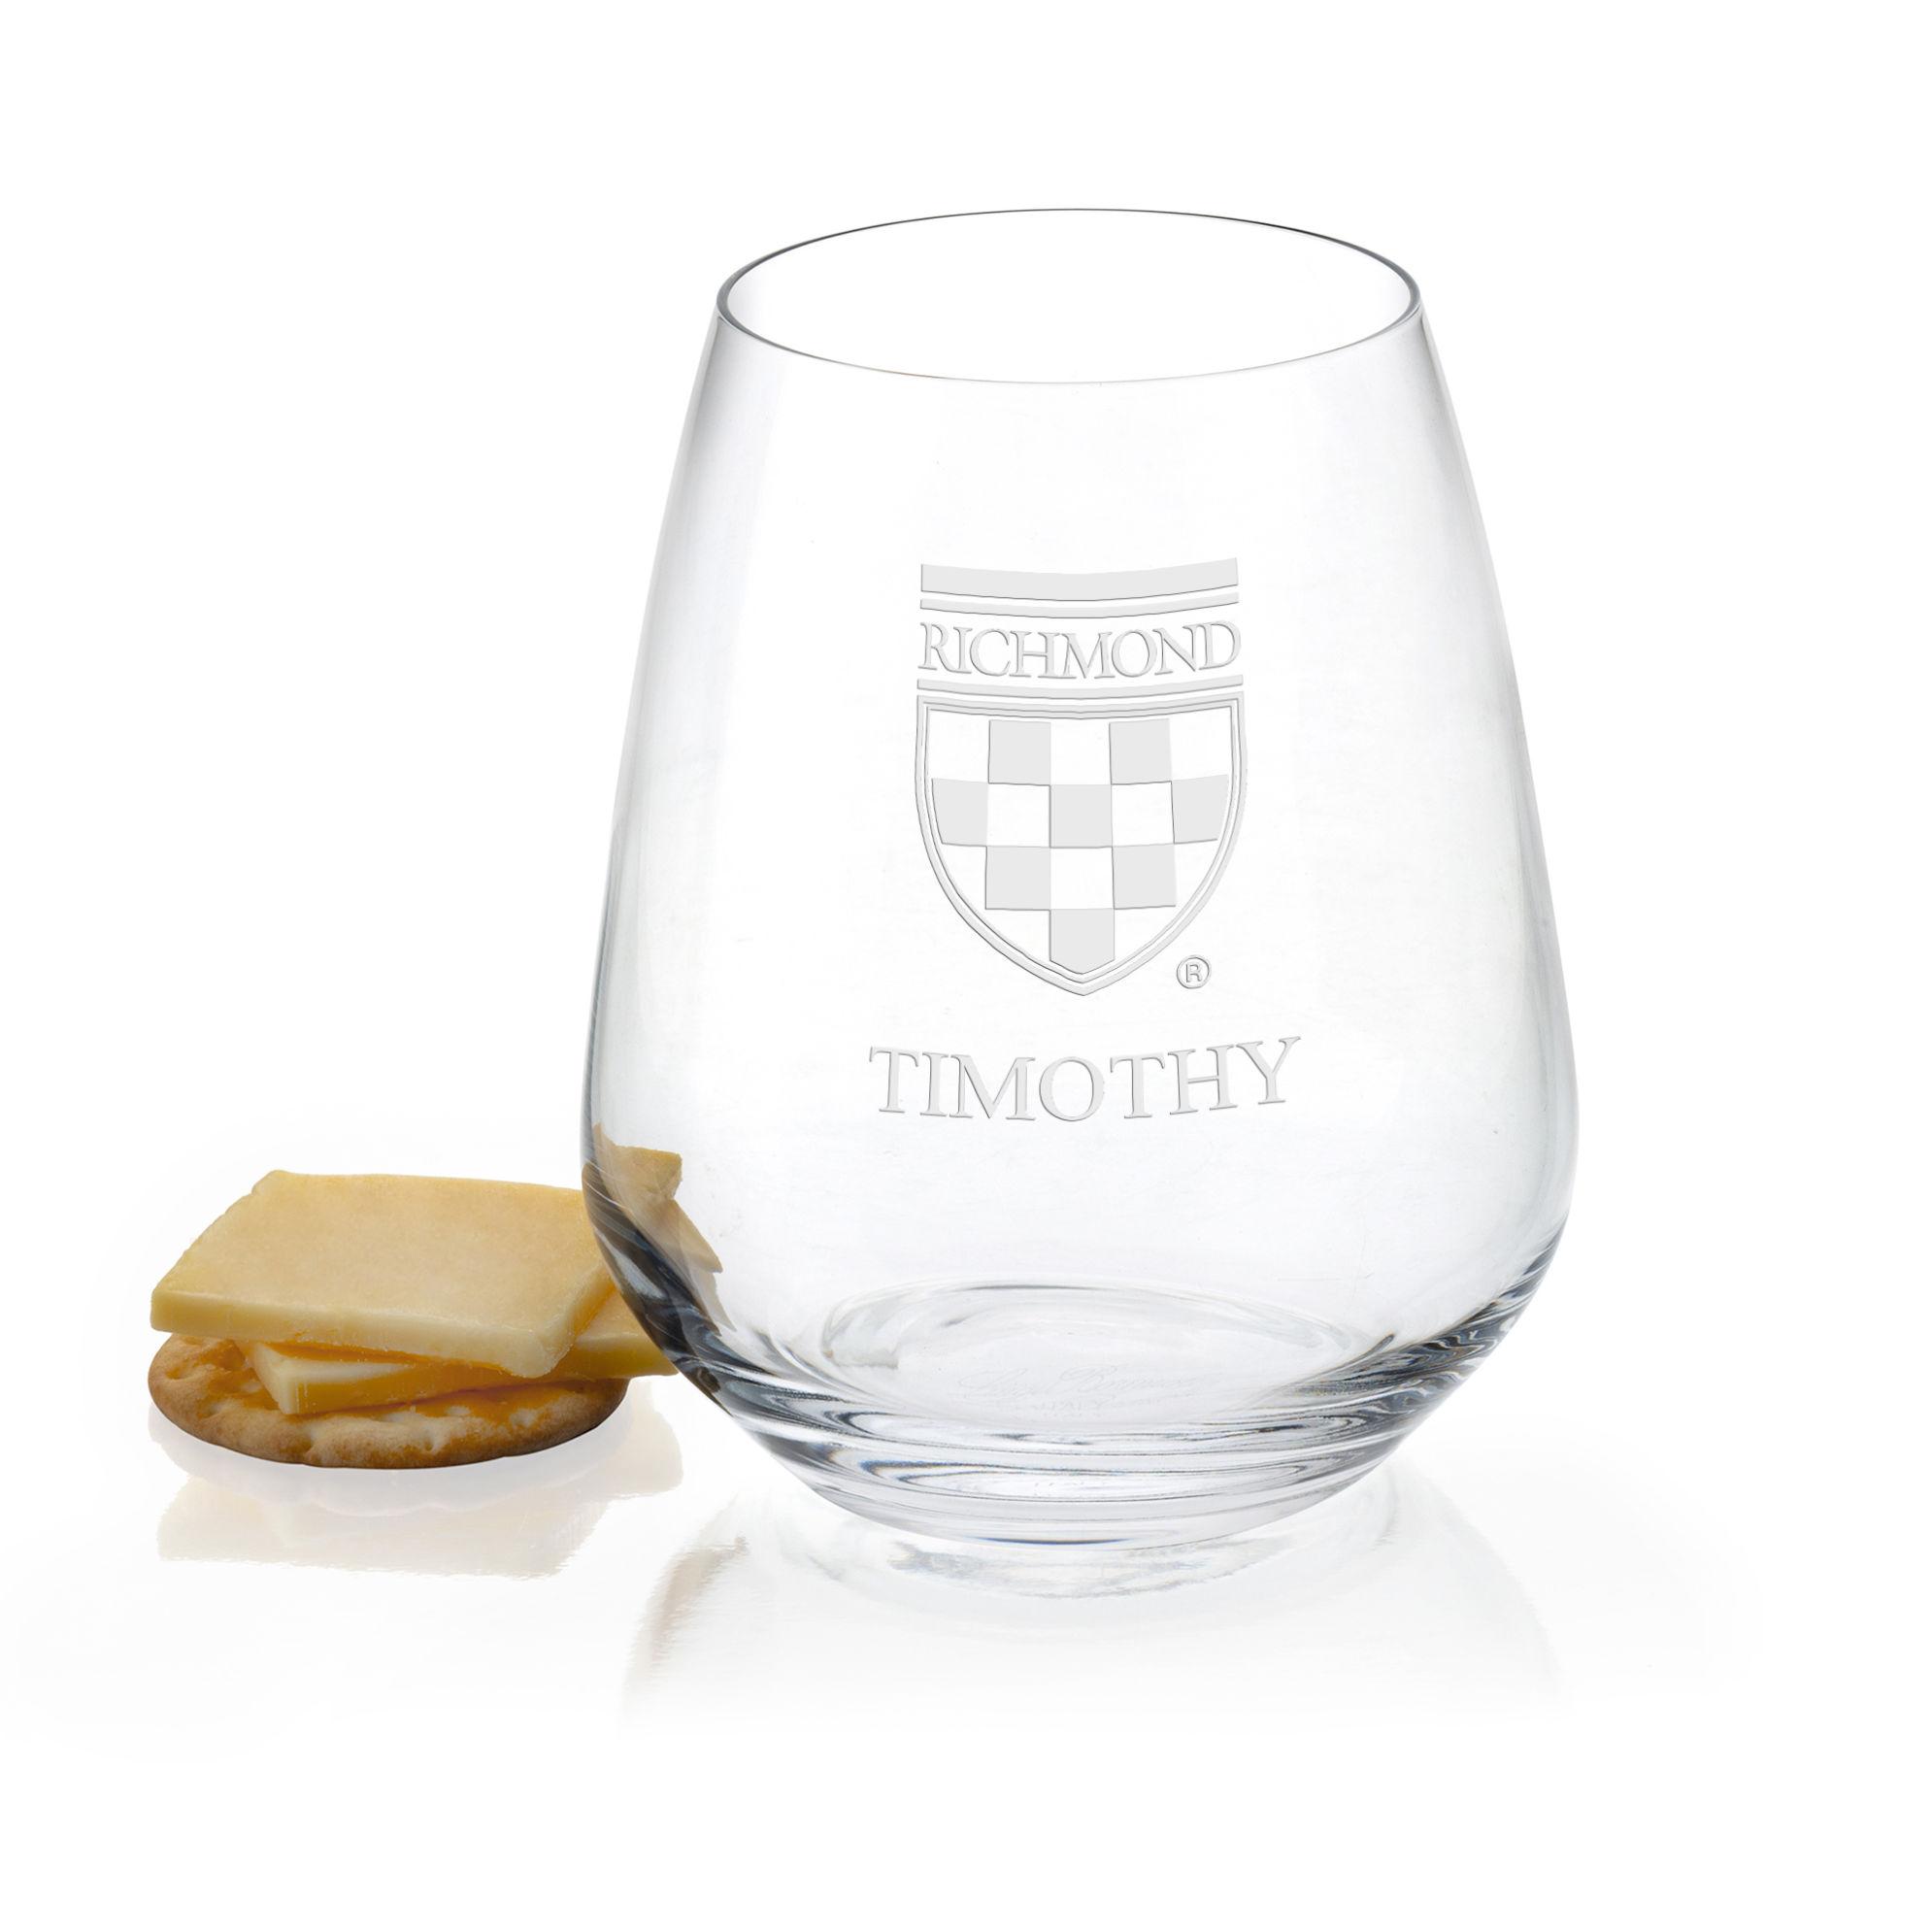 University of Richmond Stemless Wine Glasses - Set of 2